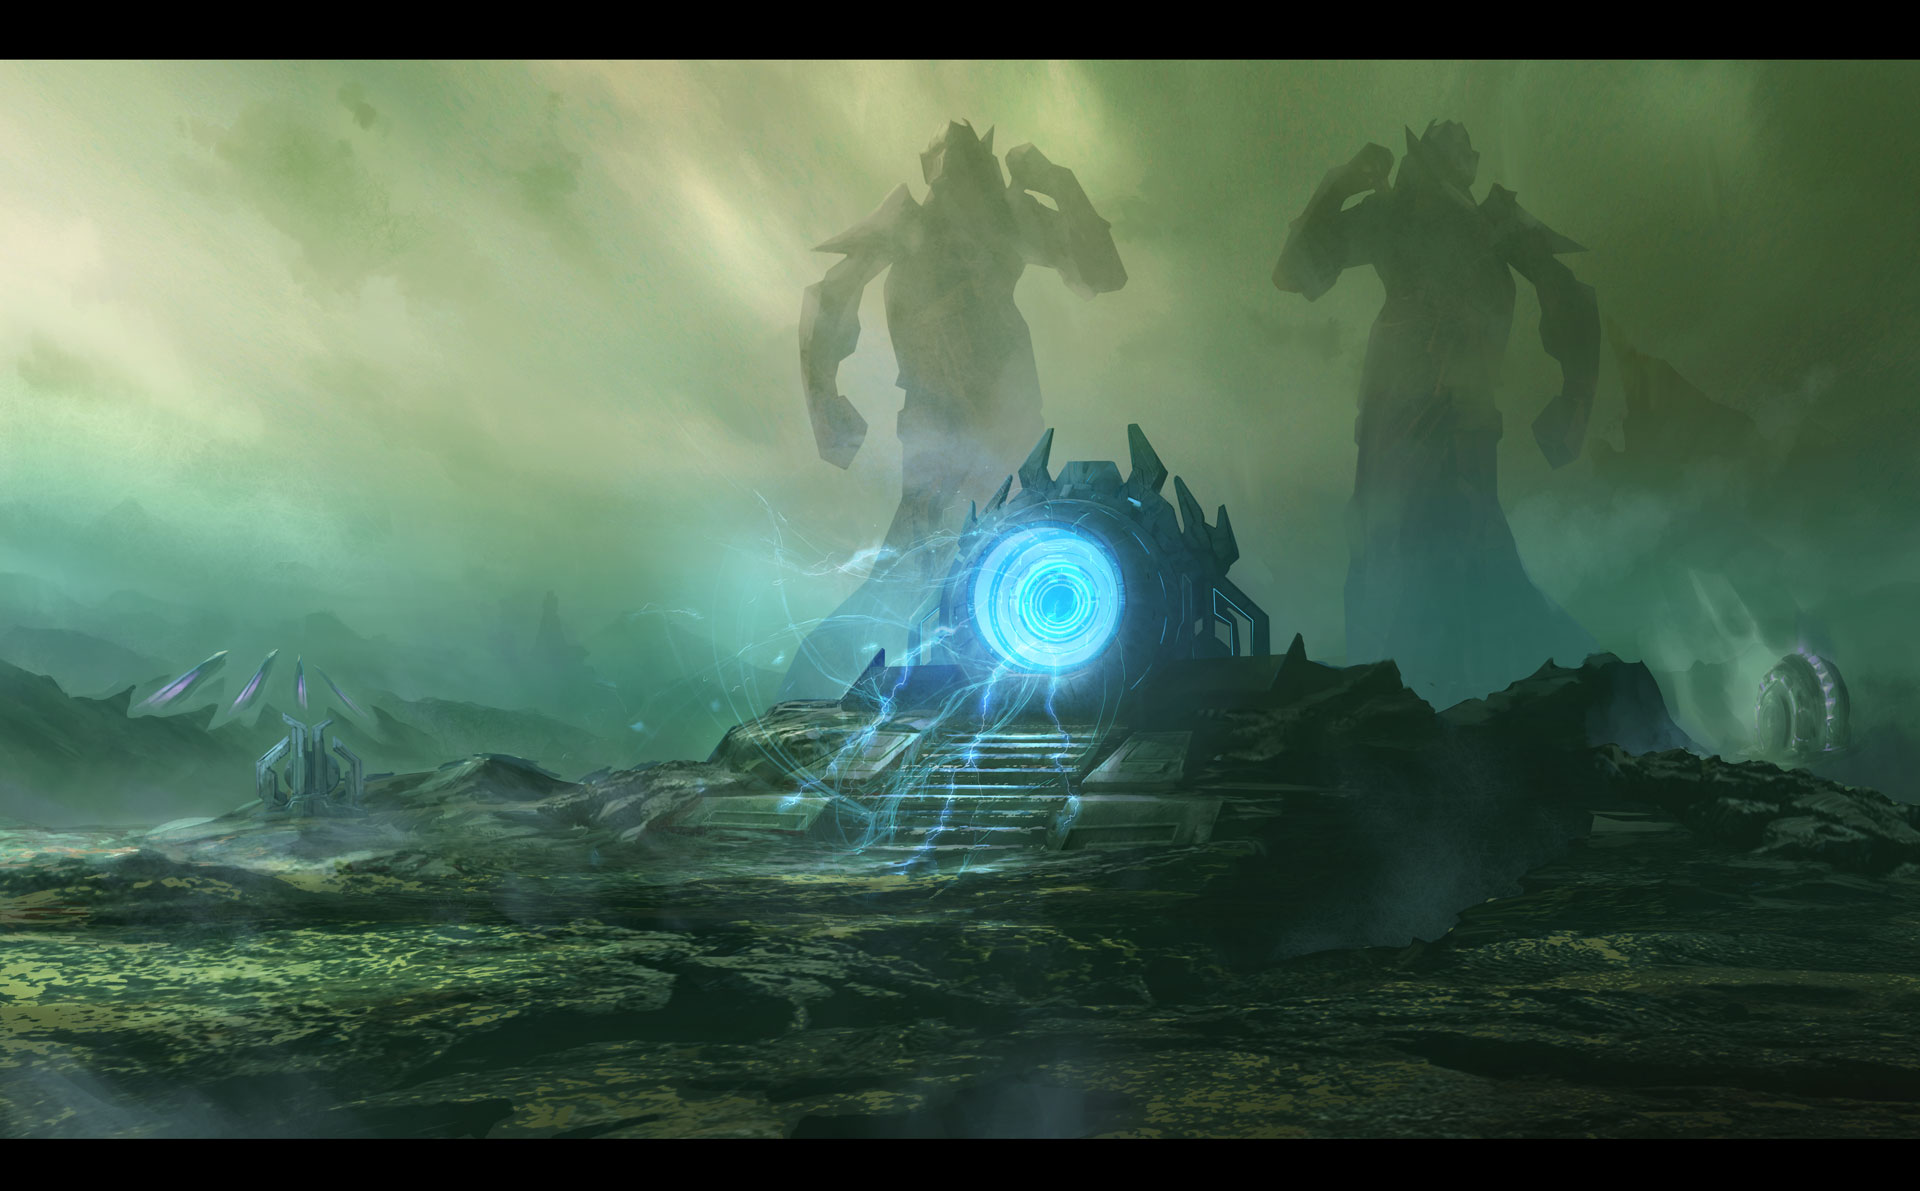 Transformers_intro_010_v003.jpg